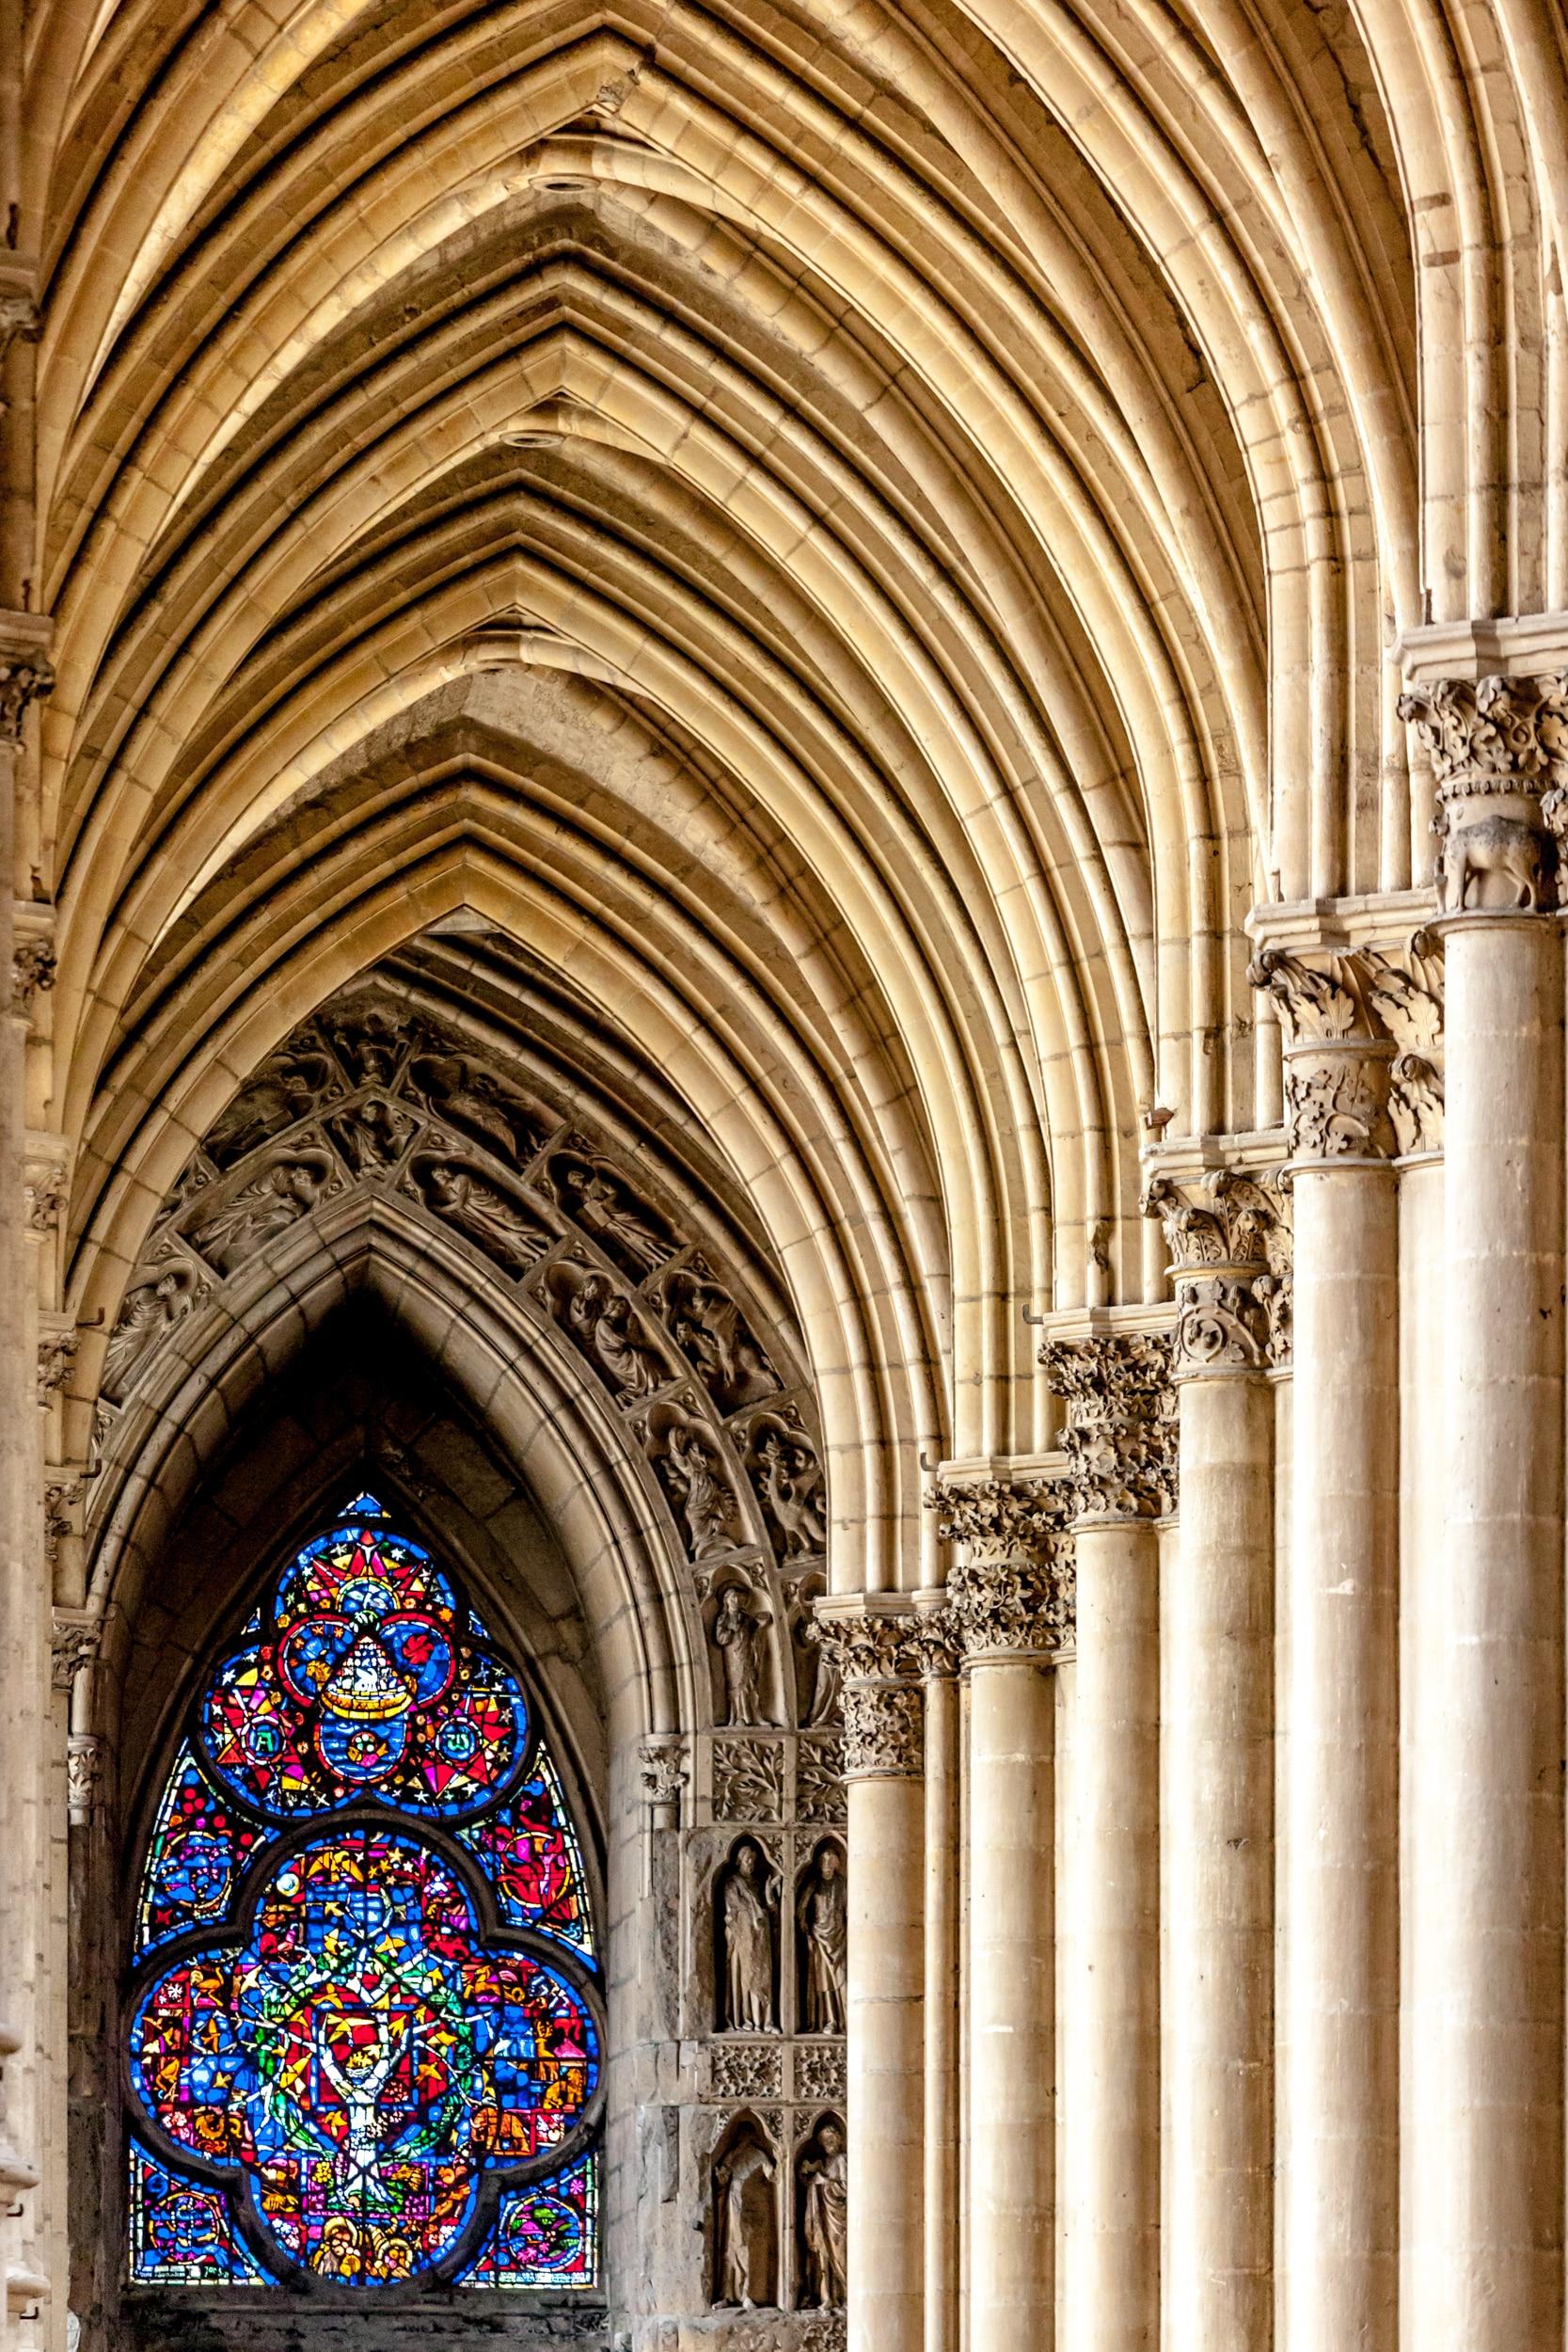 Notre-Dame de Reims Cathedral, France - IMG_7862.jpg